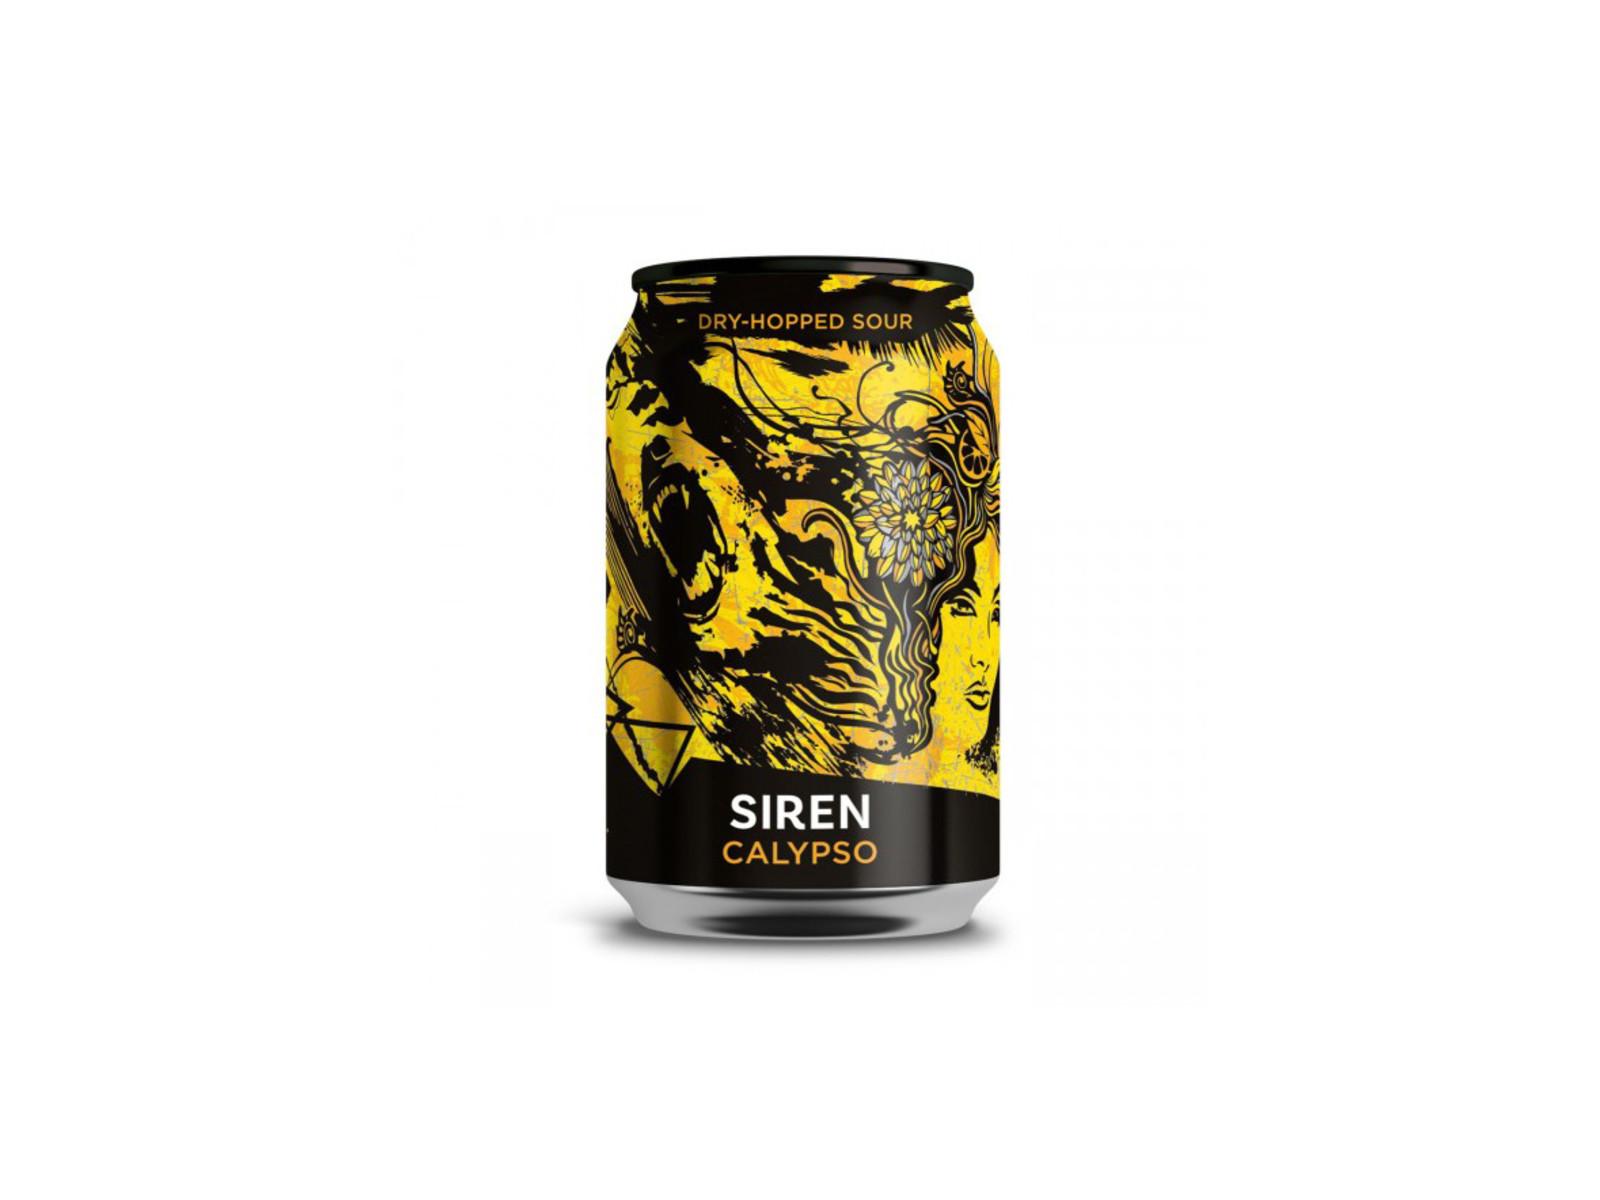 Siren Calypso / Dry Hopped Sour